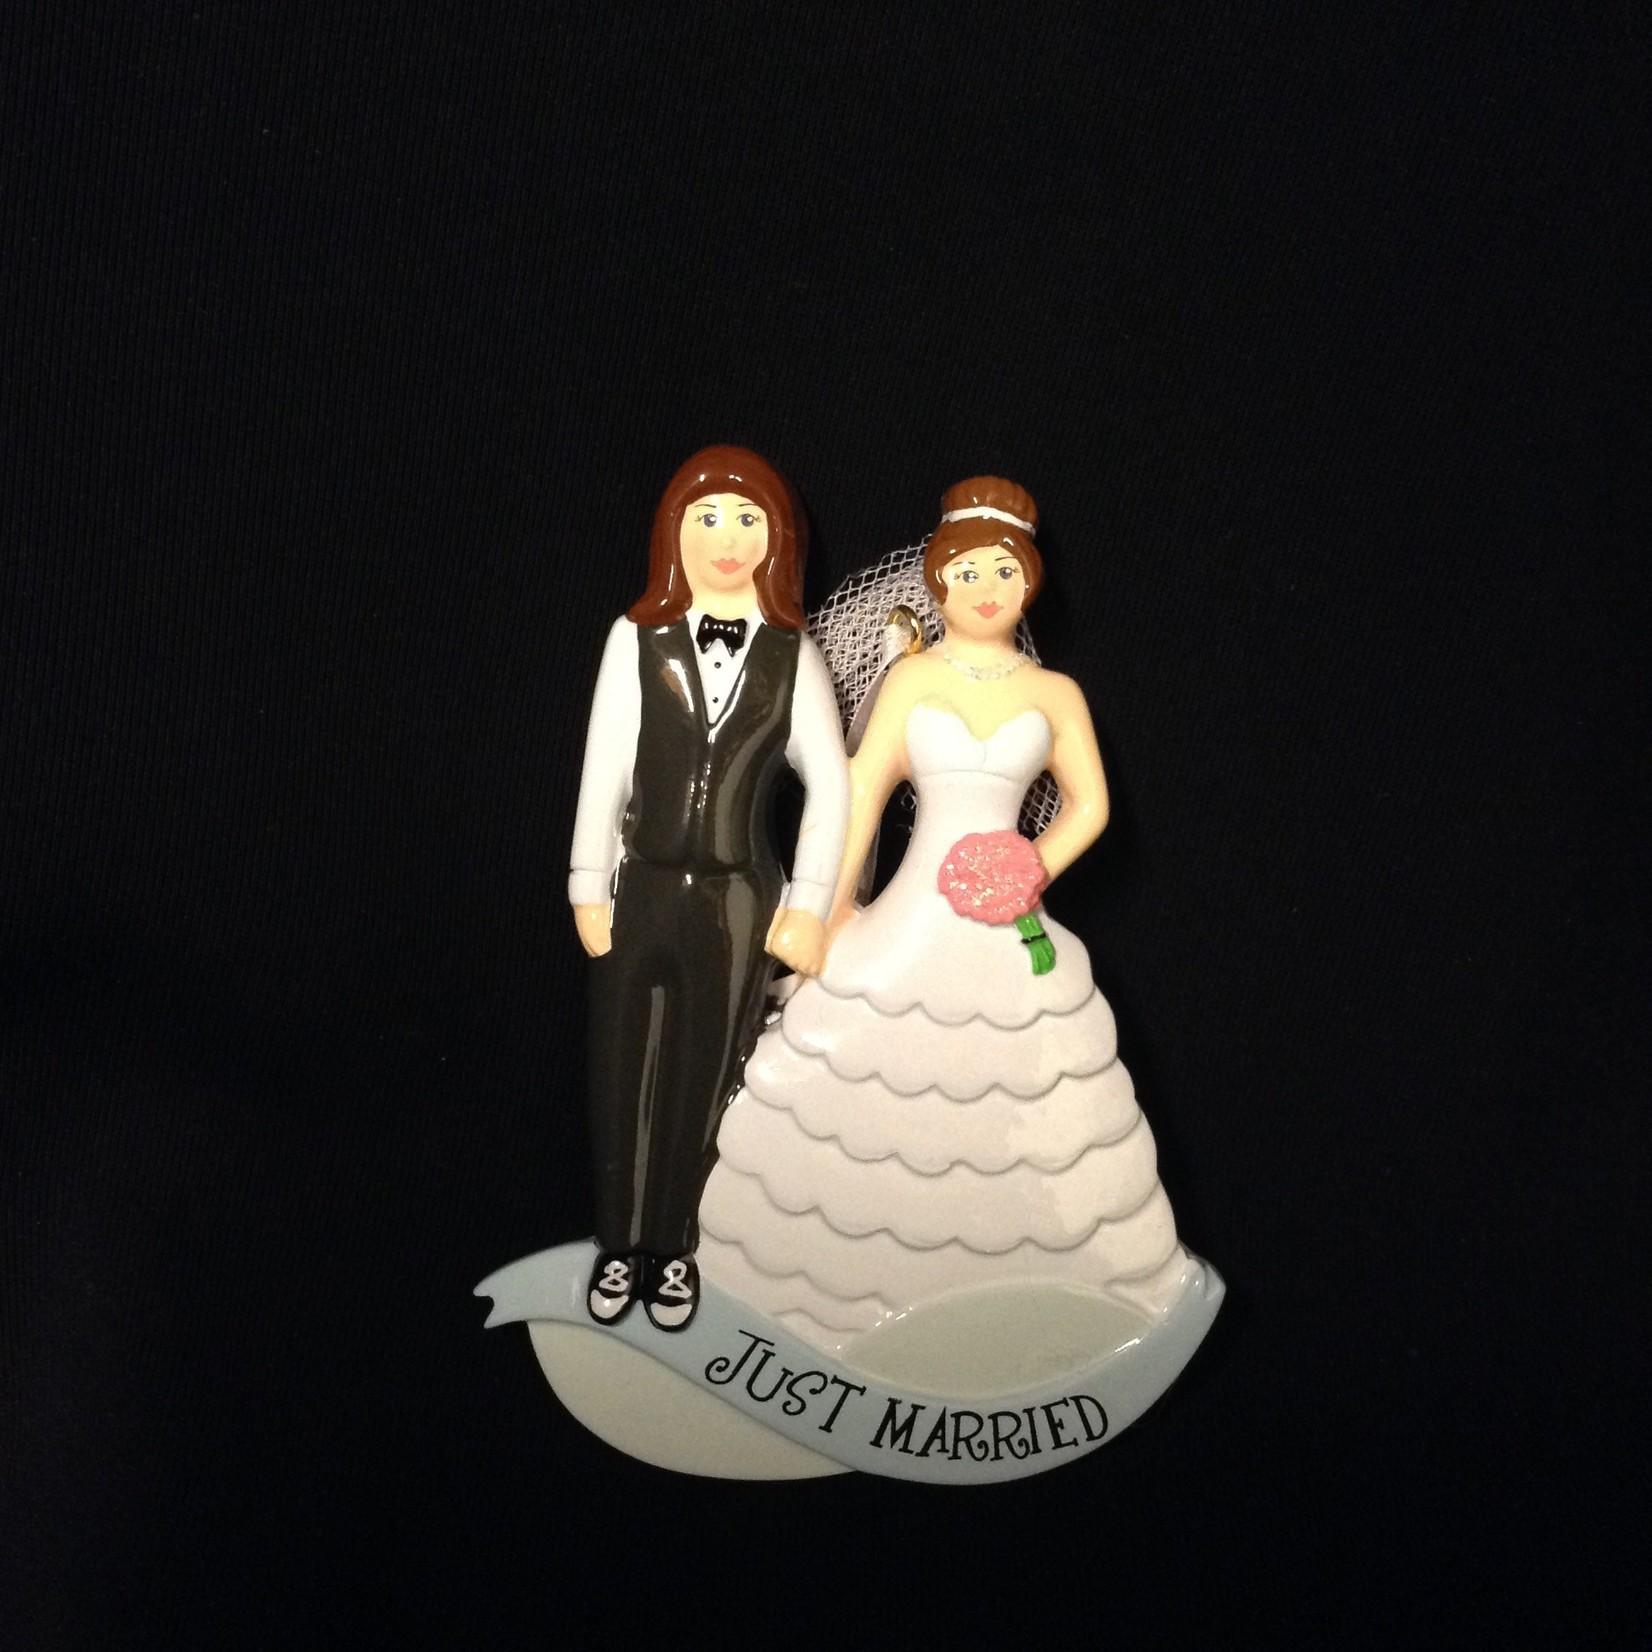 Same Sex Marriage Orn - Women 2A